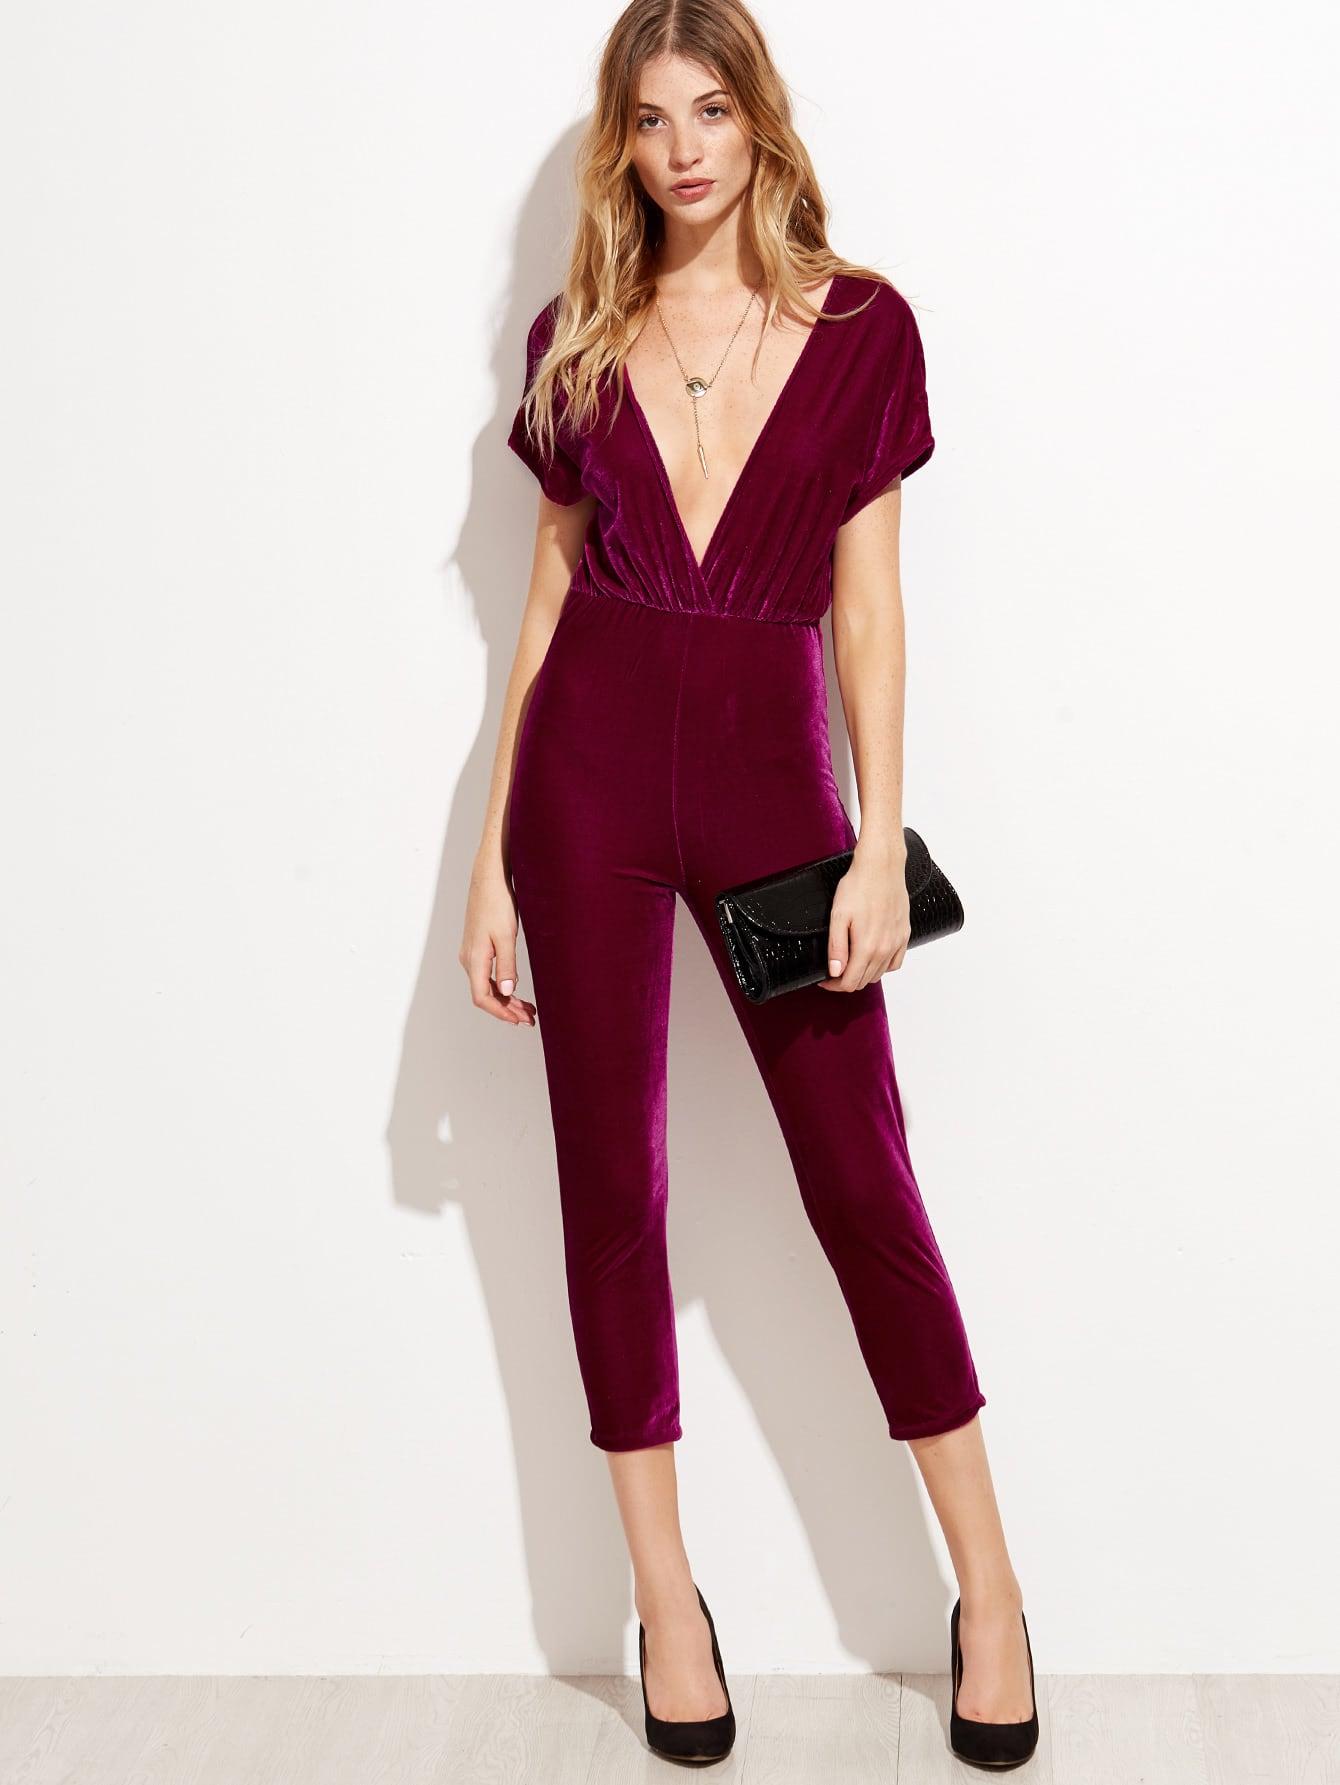 Deep V Neck Zipper Back Velvet Jumpsuit jumpsuit160919301